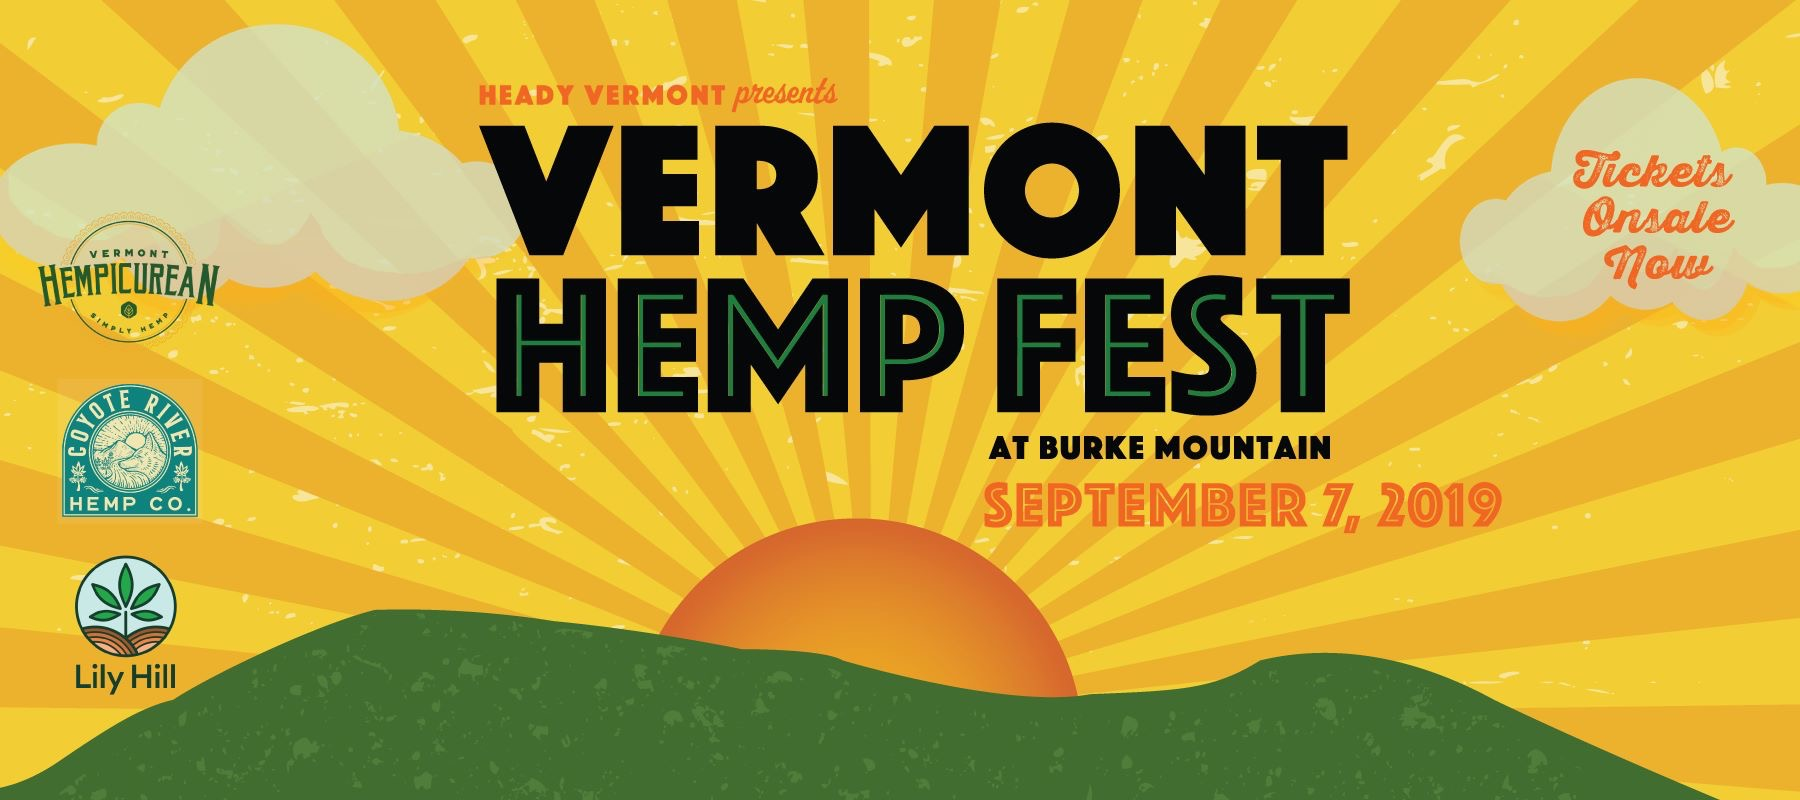 Vermont Hemp Fest 2019